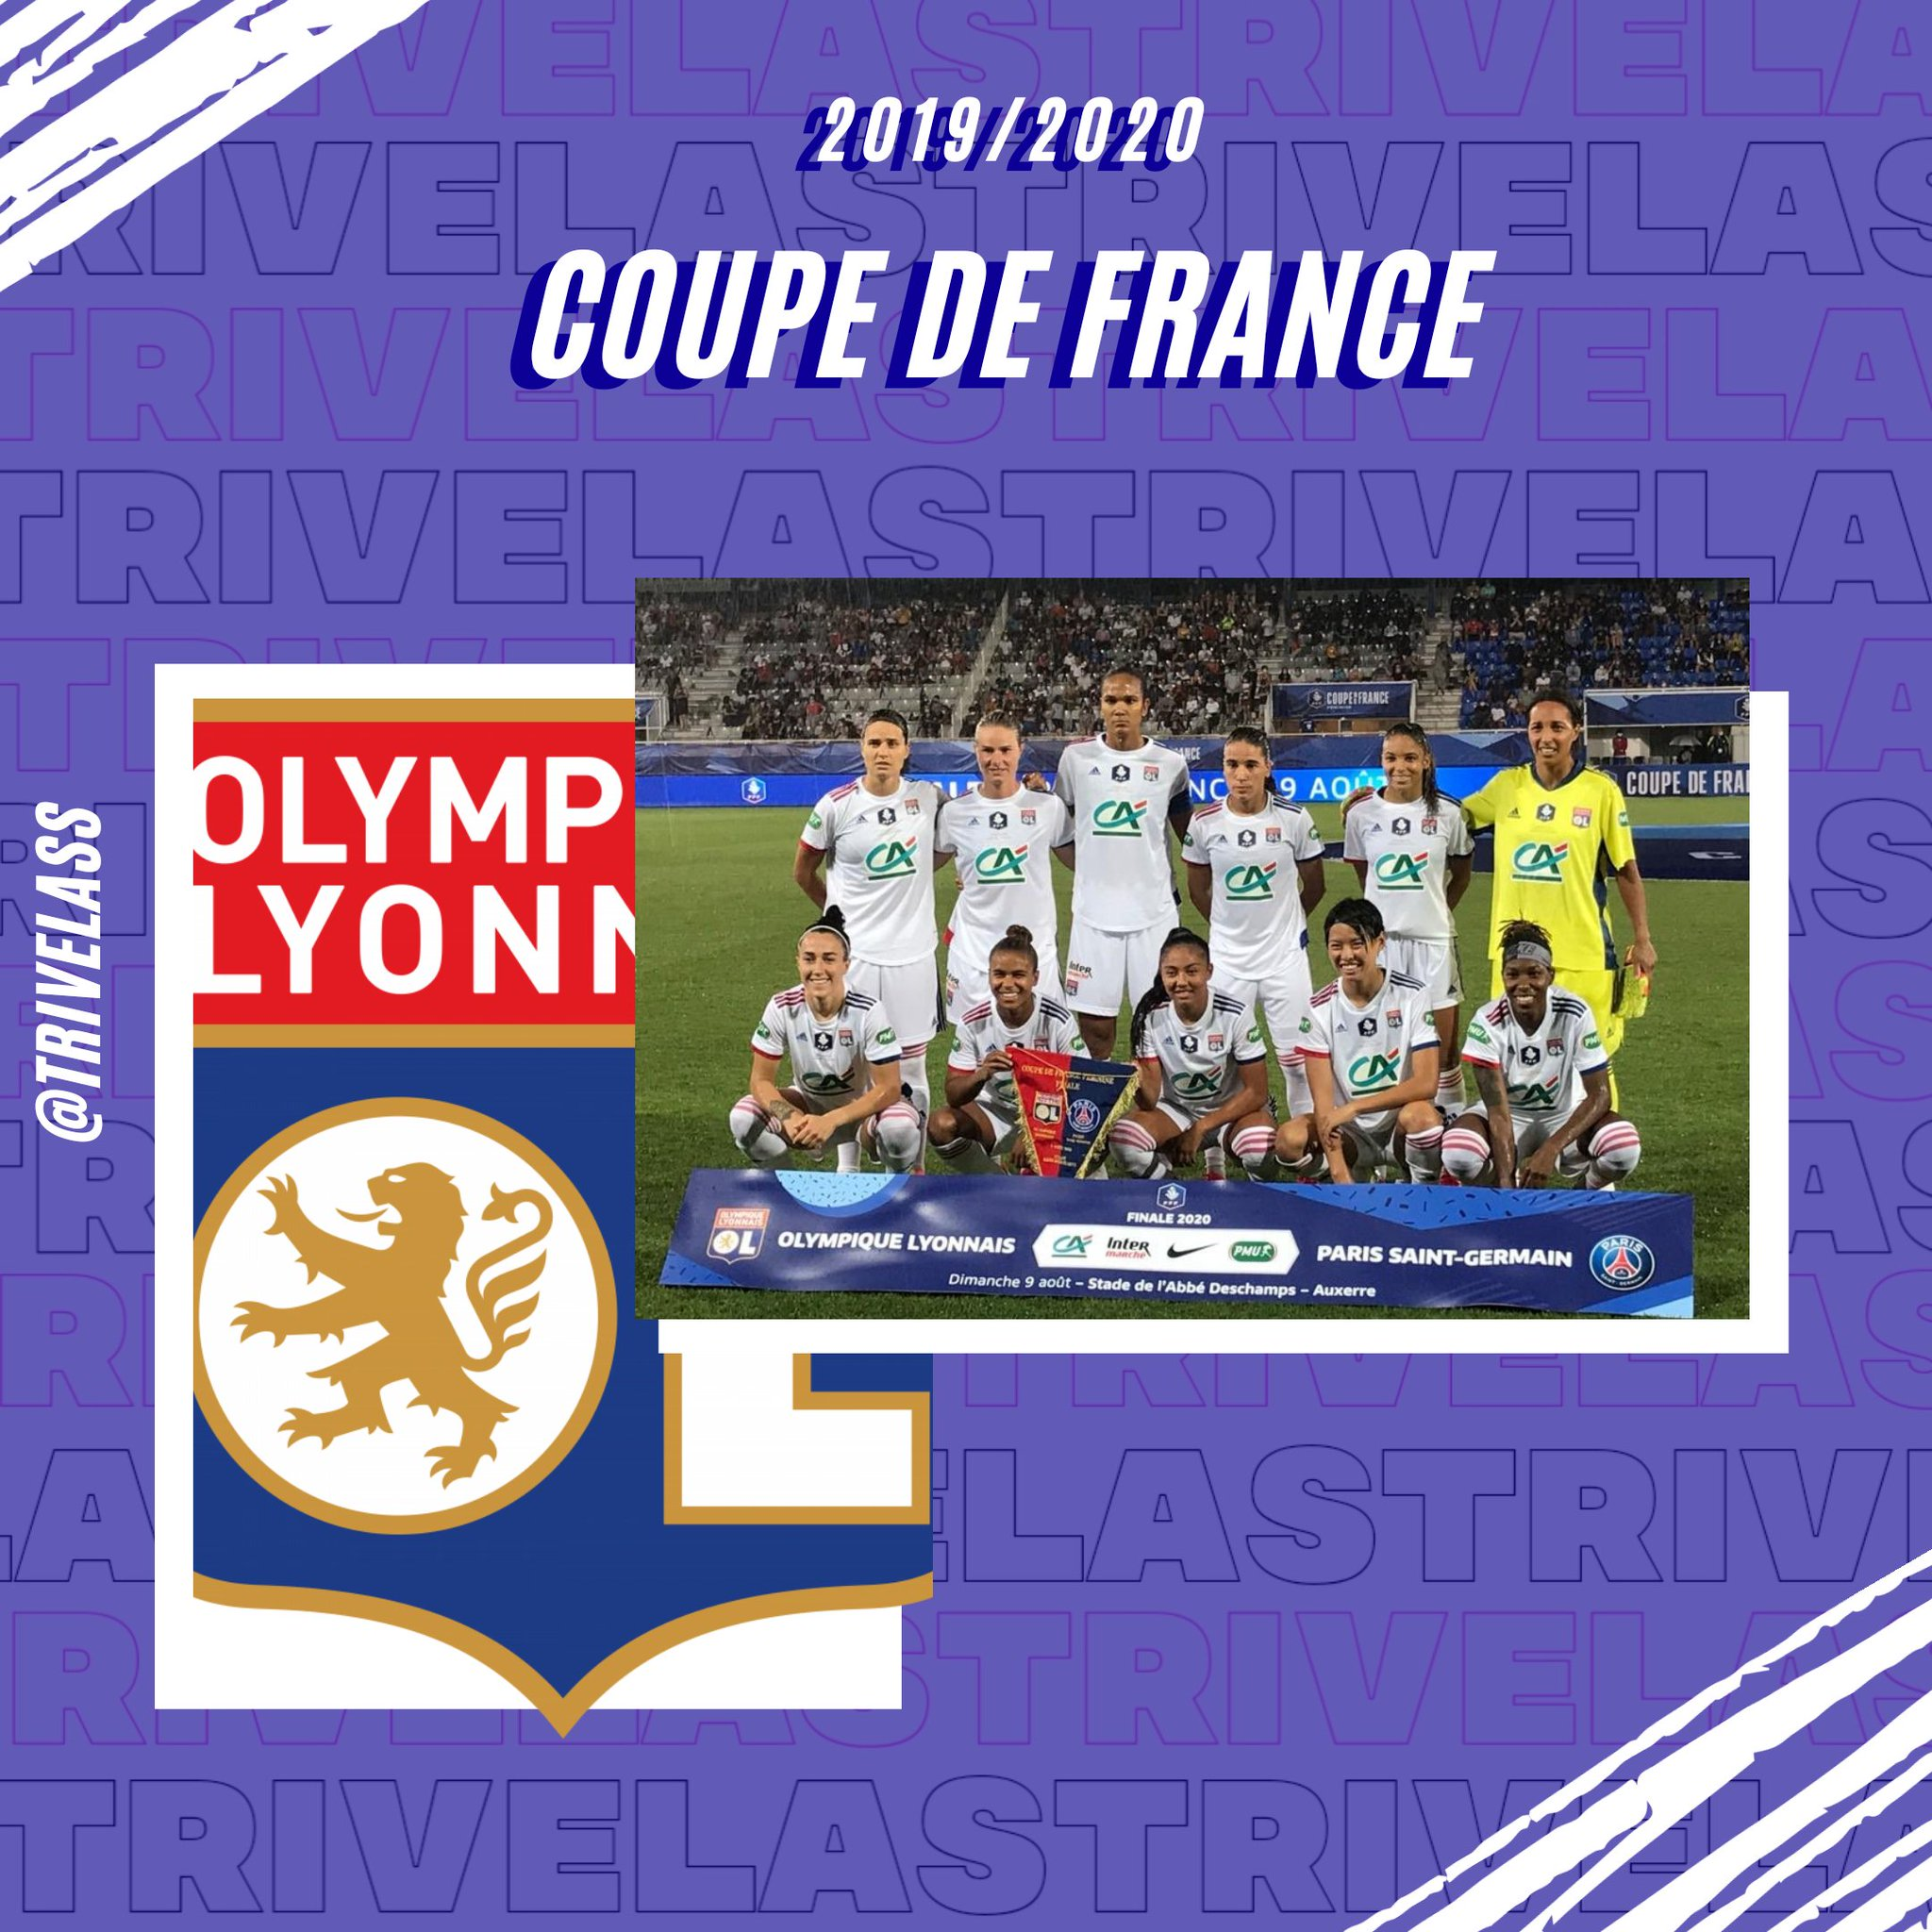 #CoupedeFrance Photo